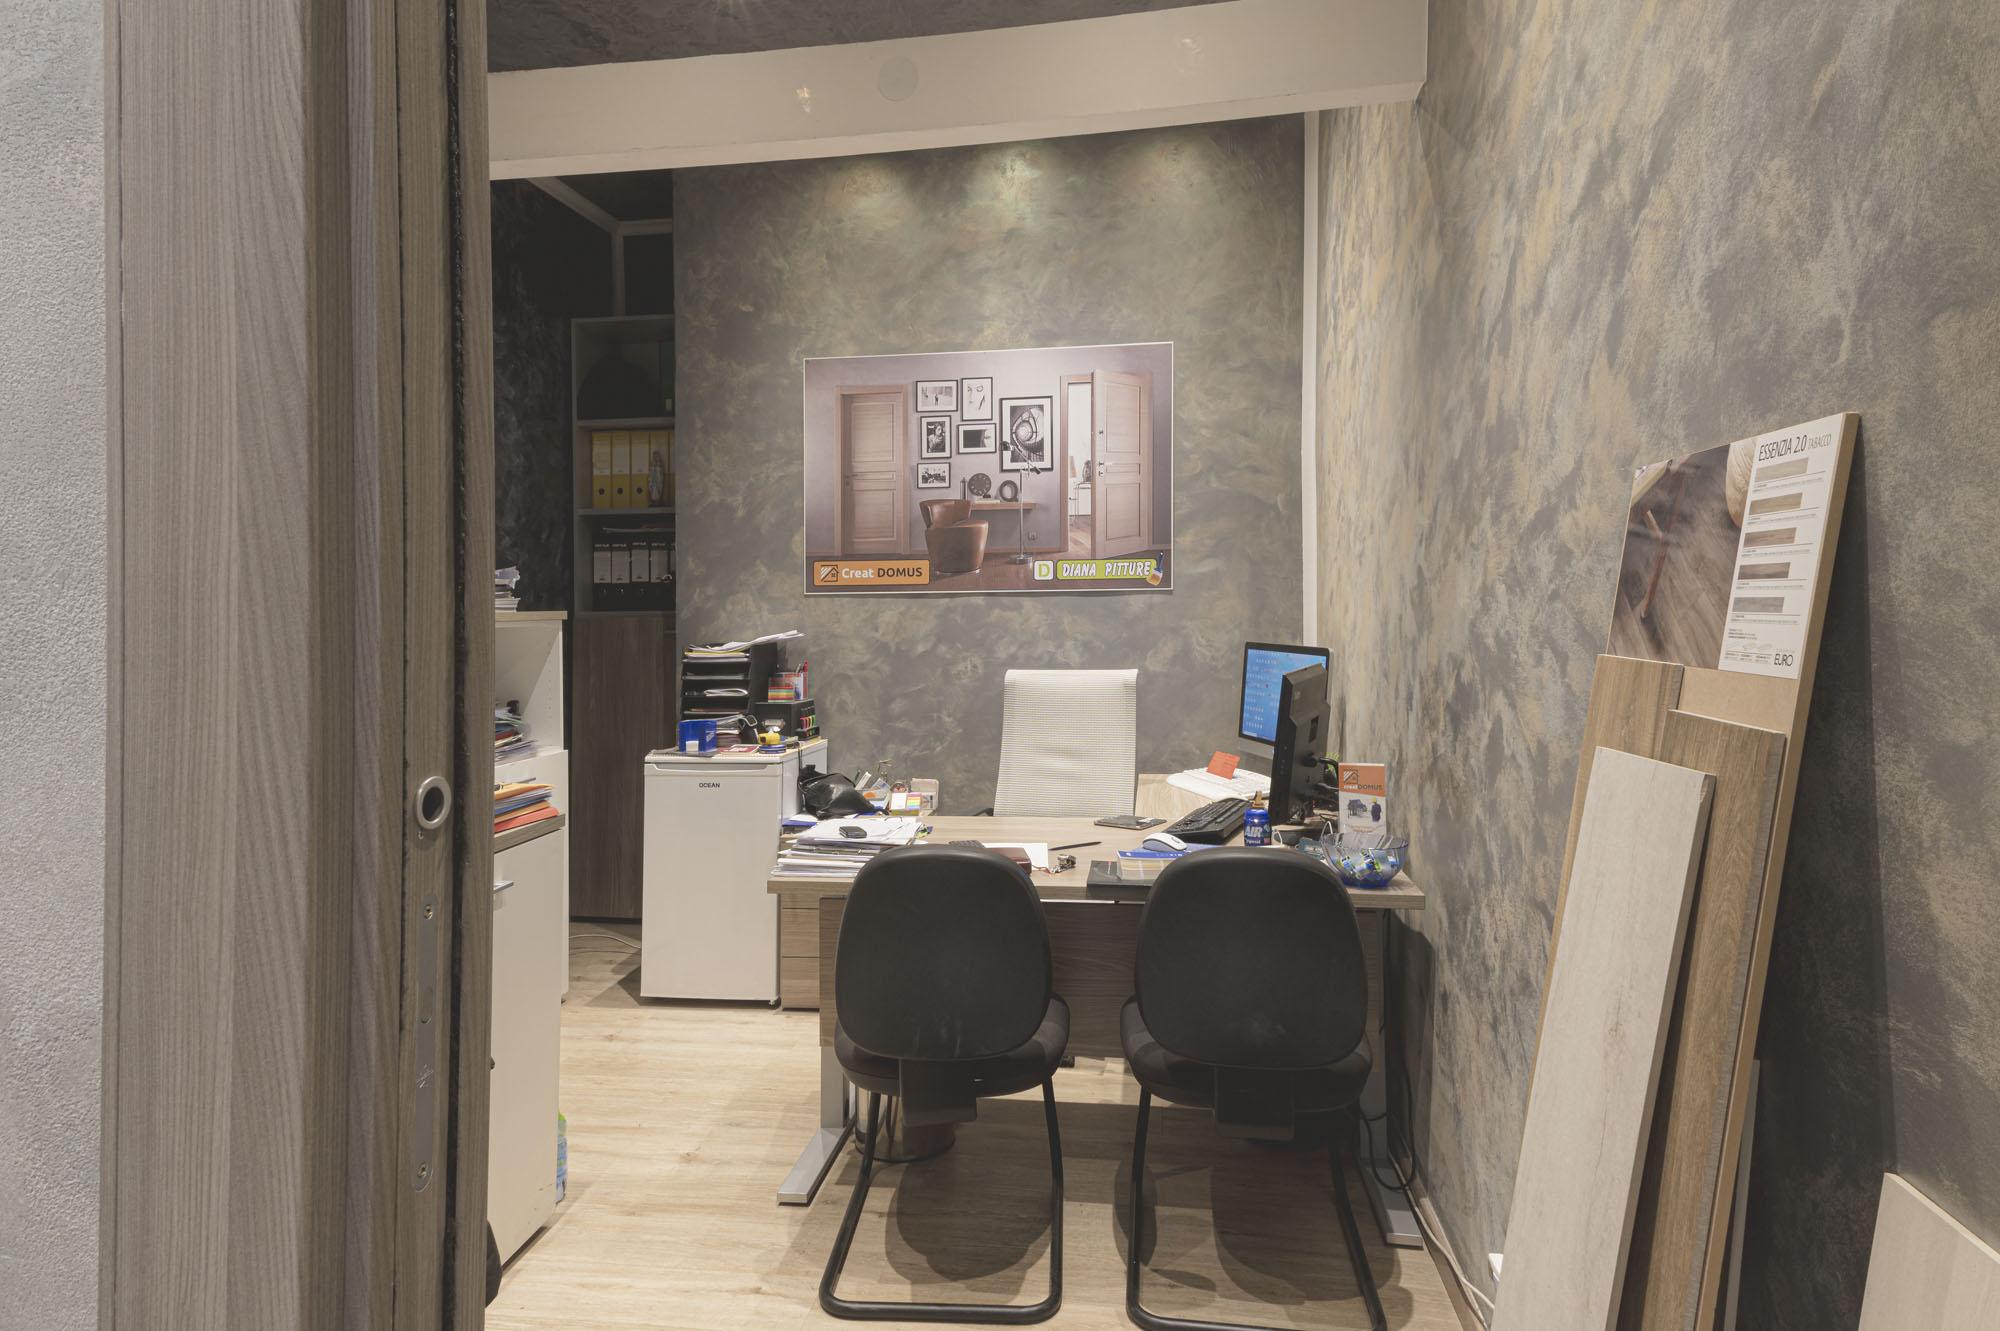 DSC5870 - Showroom ristrutturazioni